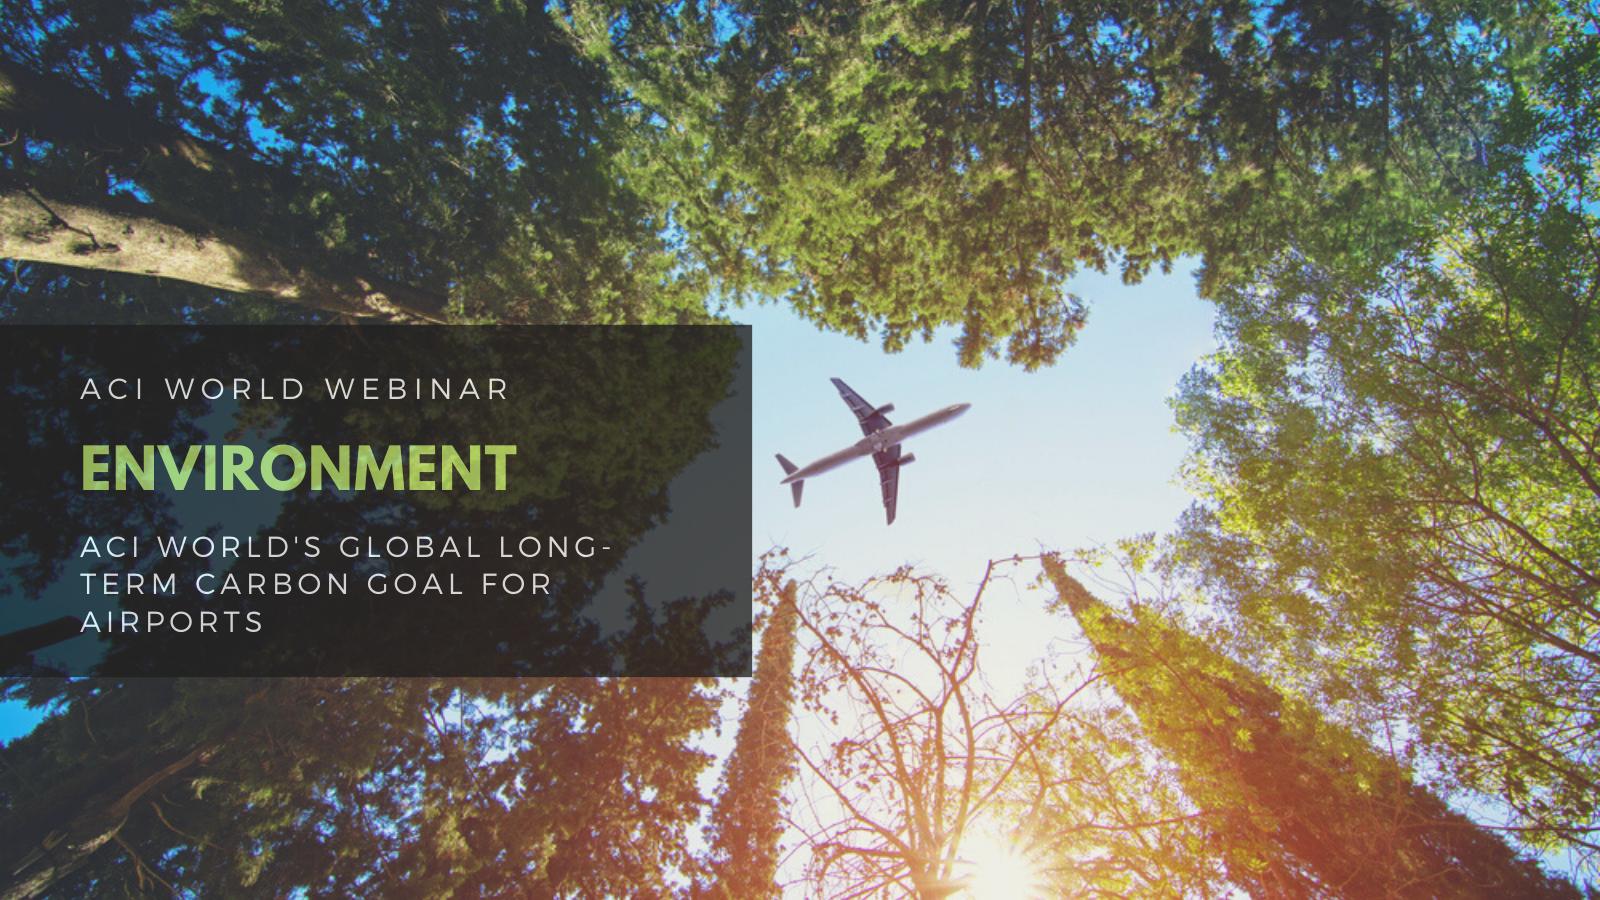 Environment webinar - Website image